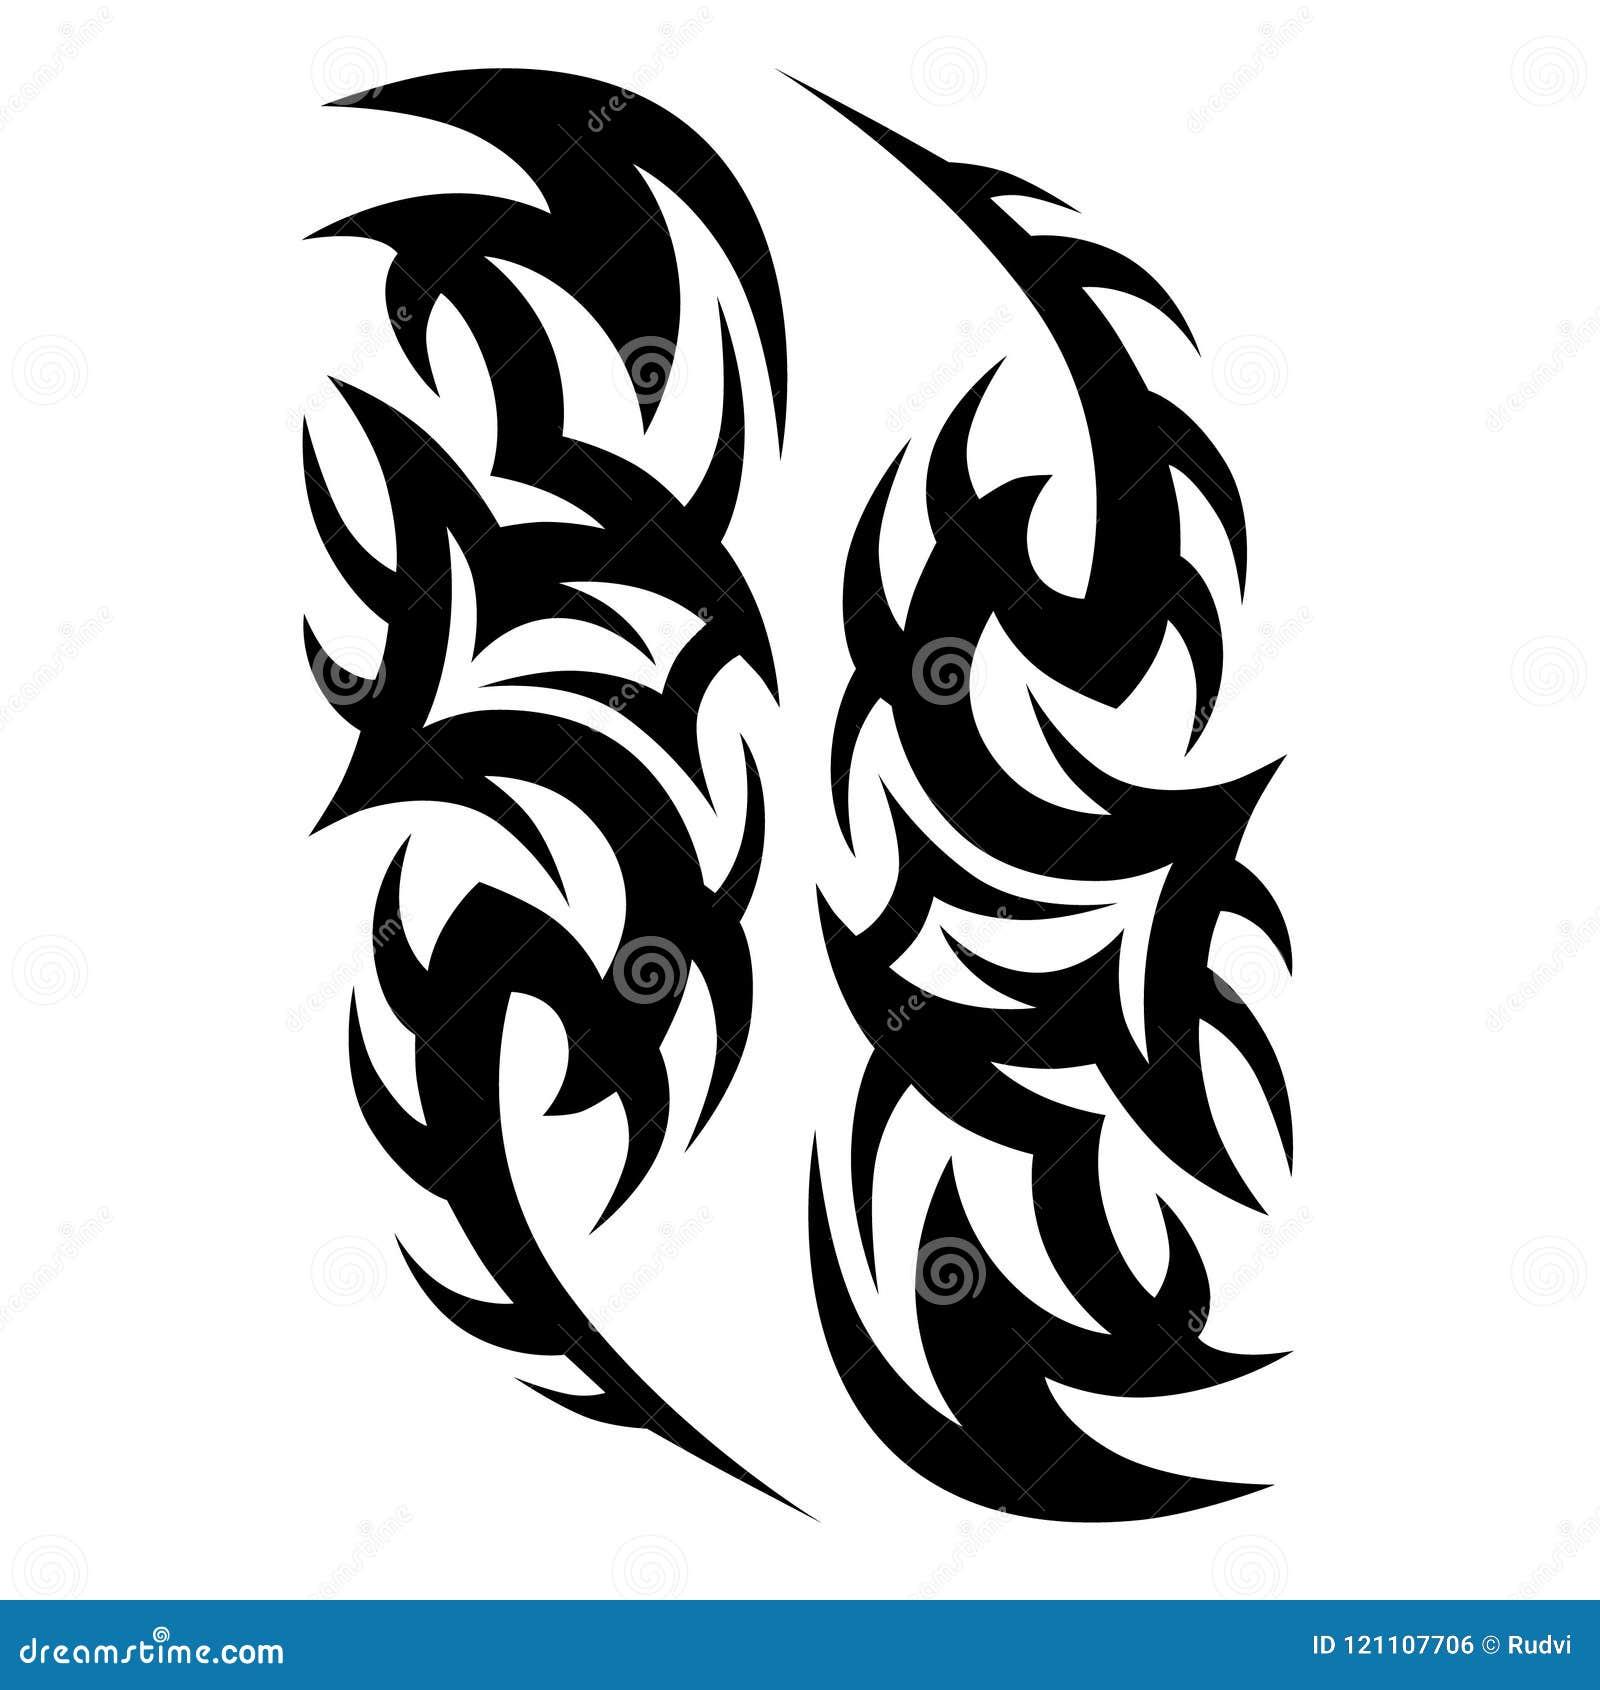 d90ce0d3b Tattoos ideas sleeve designs – tribal tattoo pattern vector illustration.  More similar stock illustrations